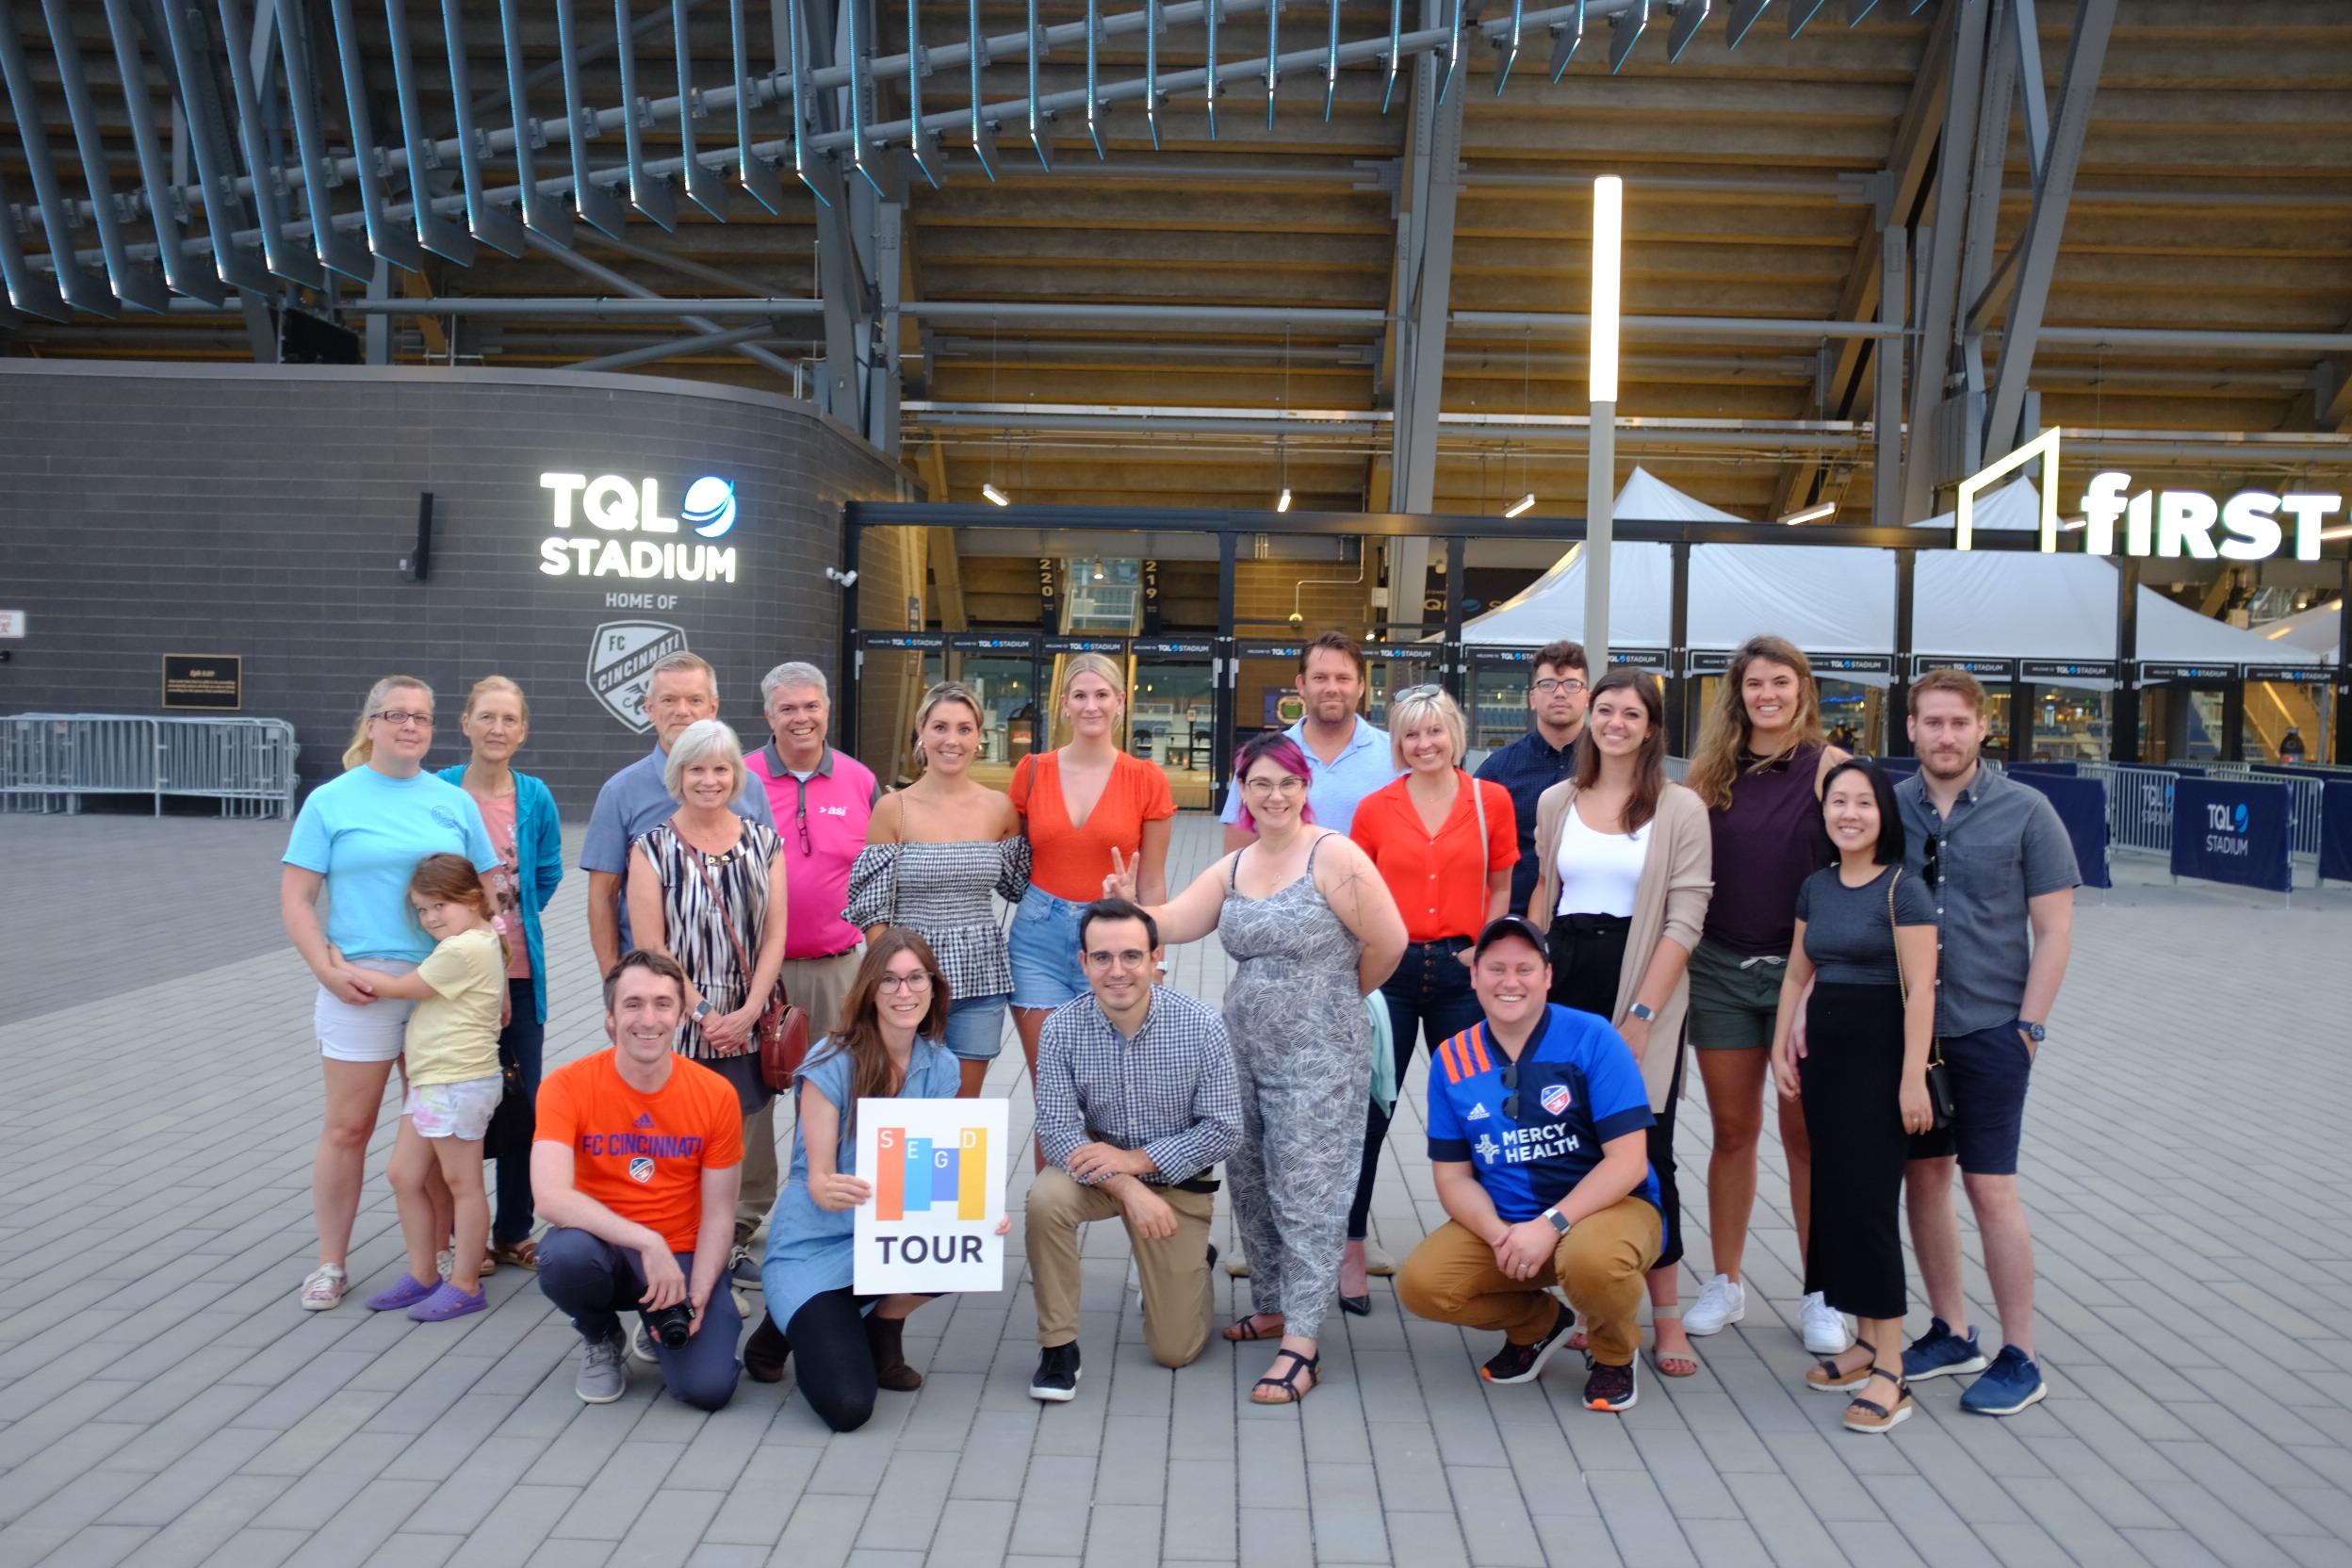 Group photo of SEGD Cincinnati tour in front of TQL Stadium